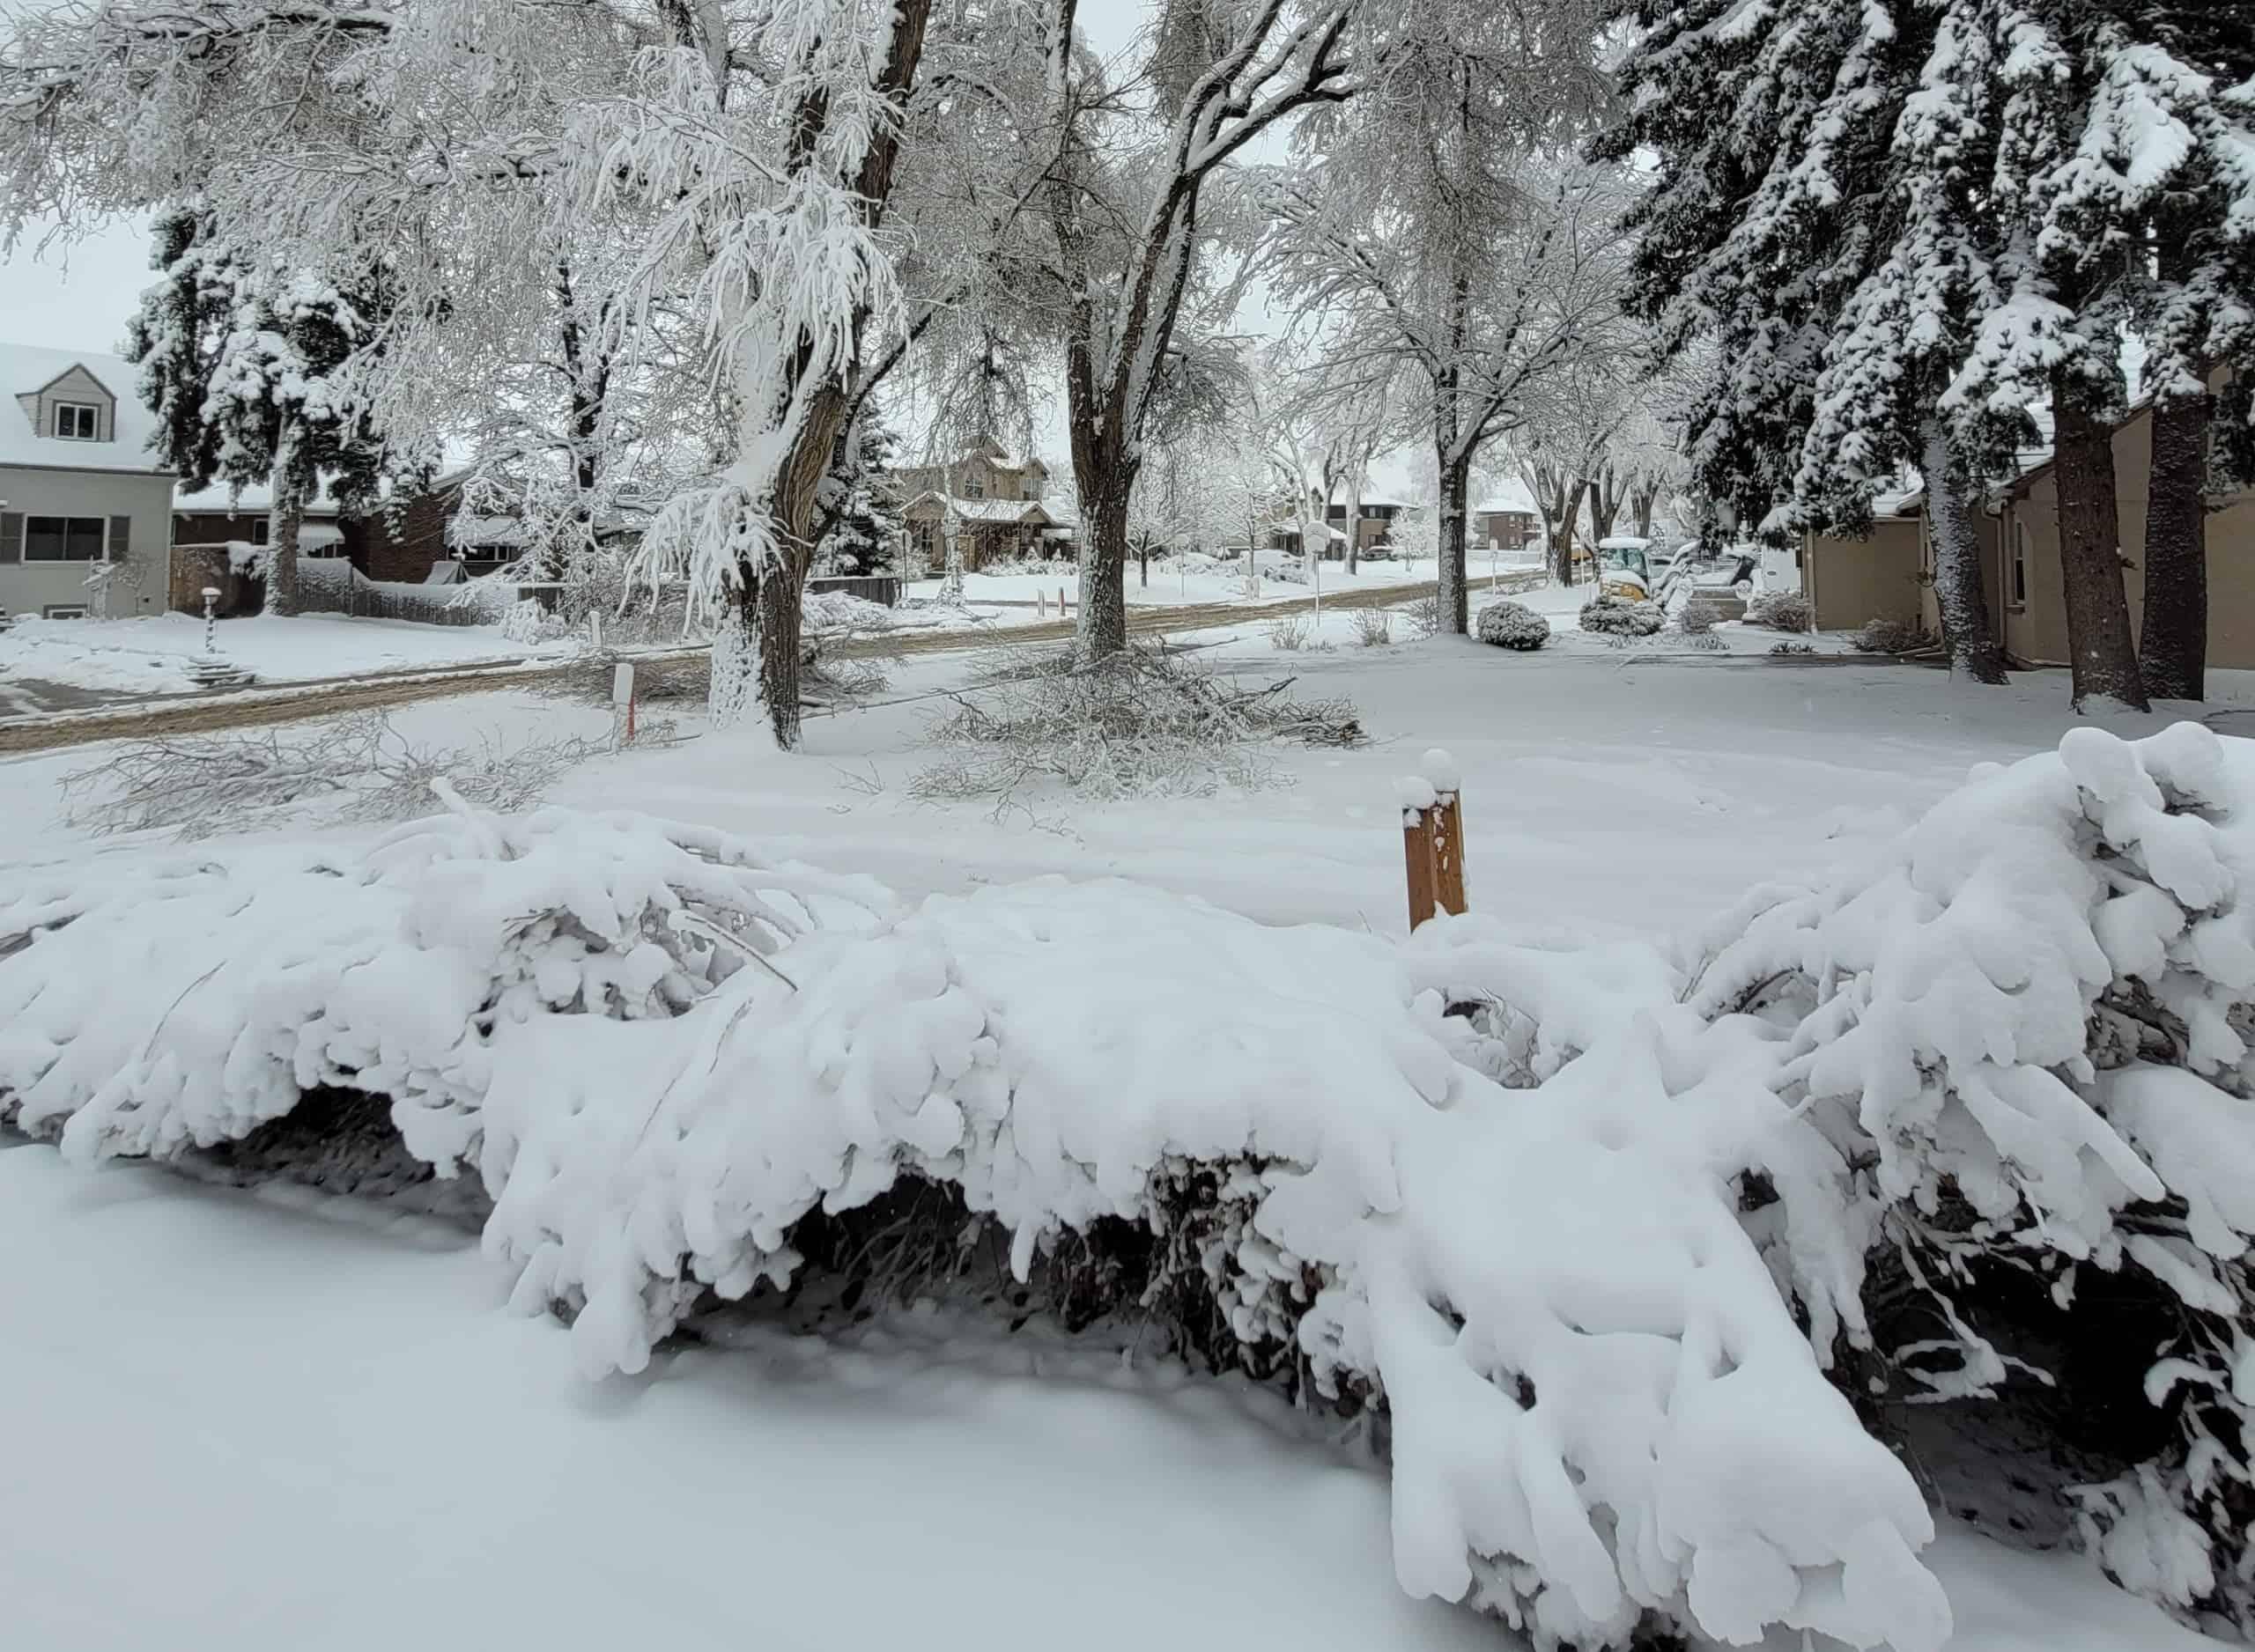 Late Spring Snow in Colorado